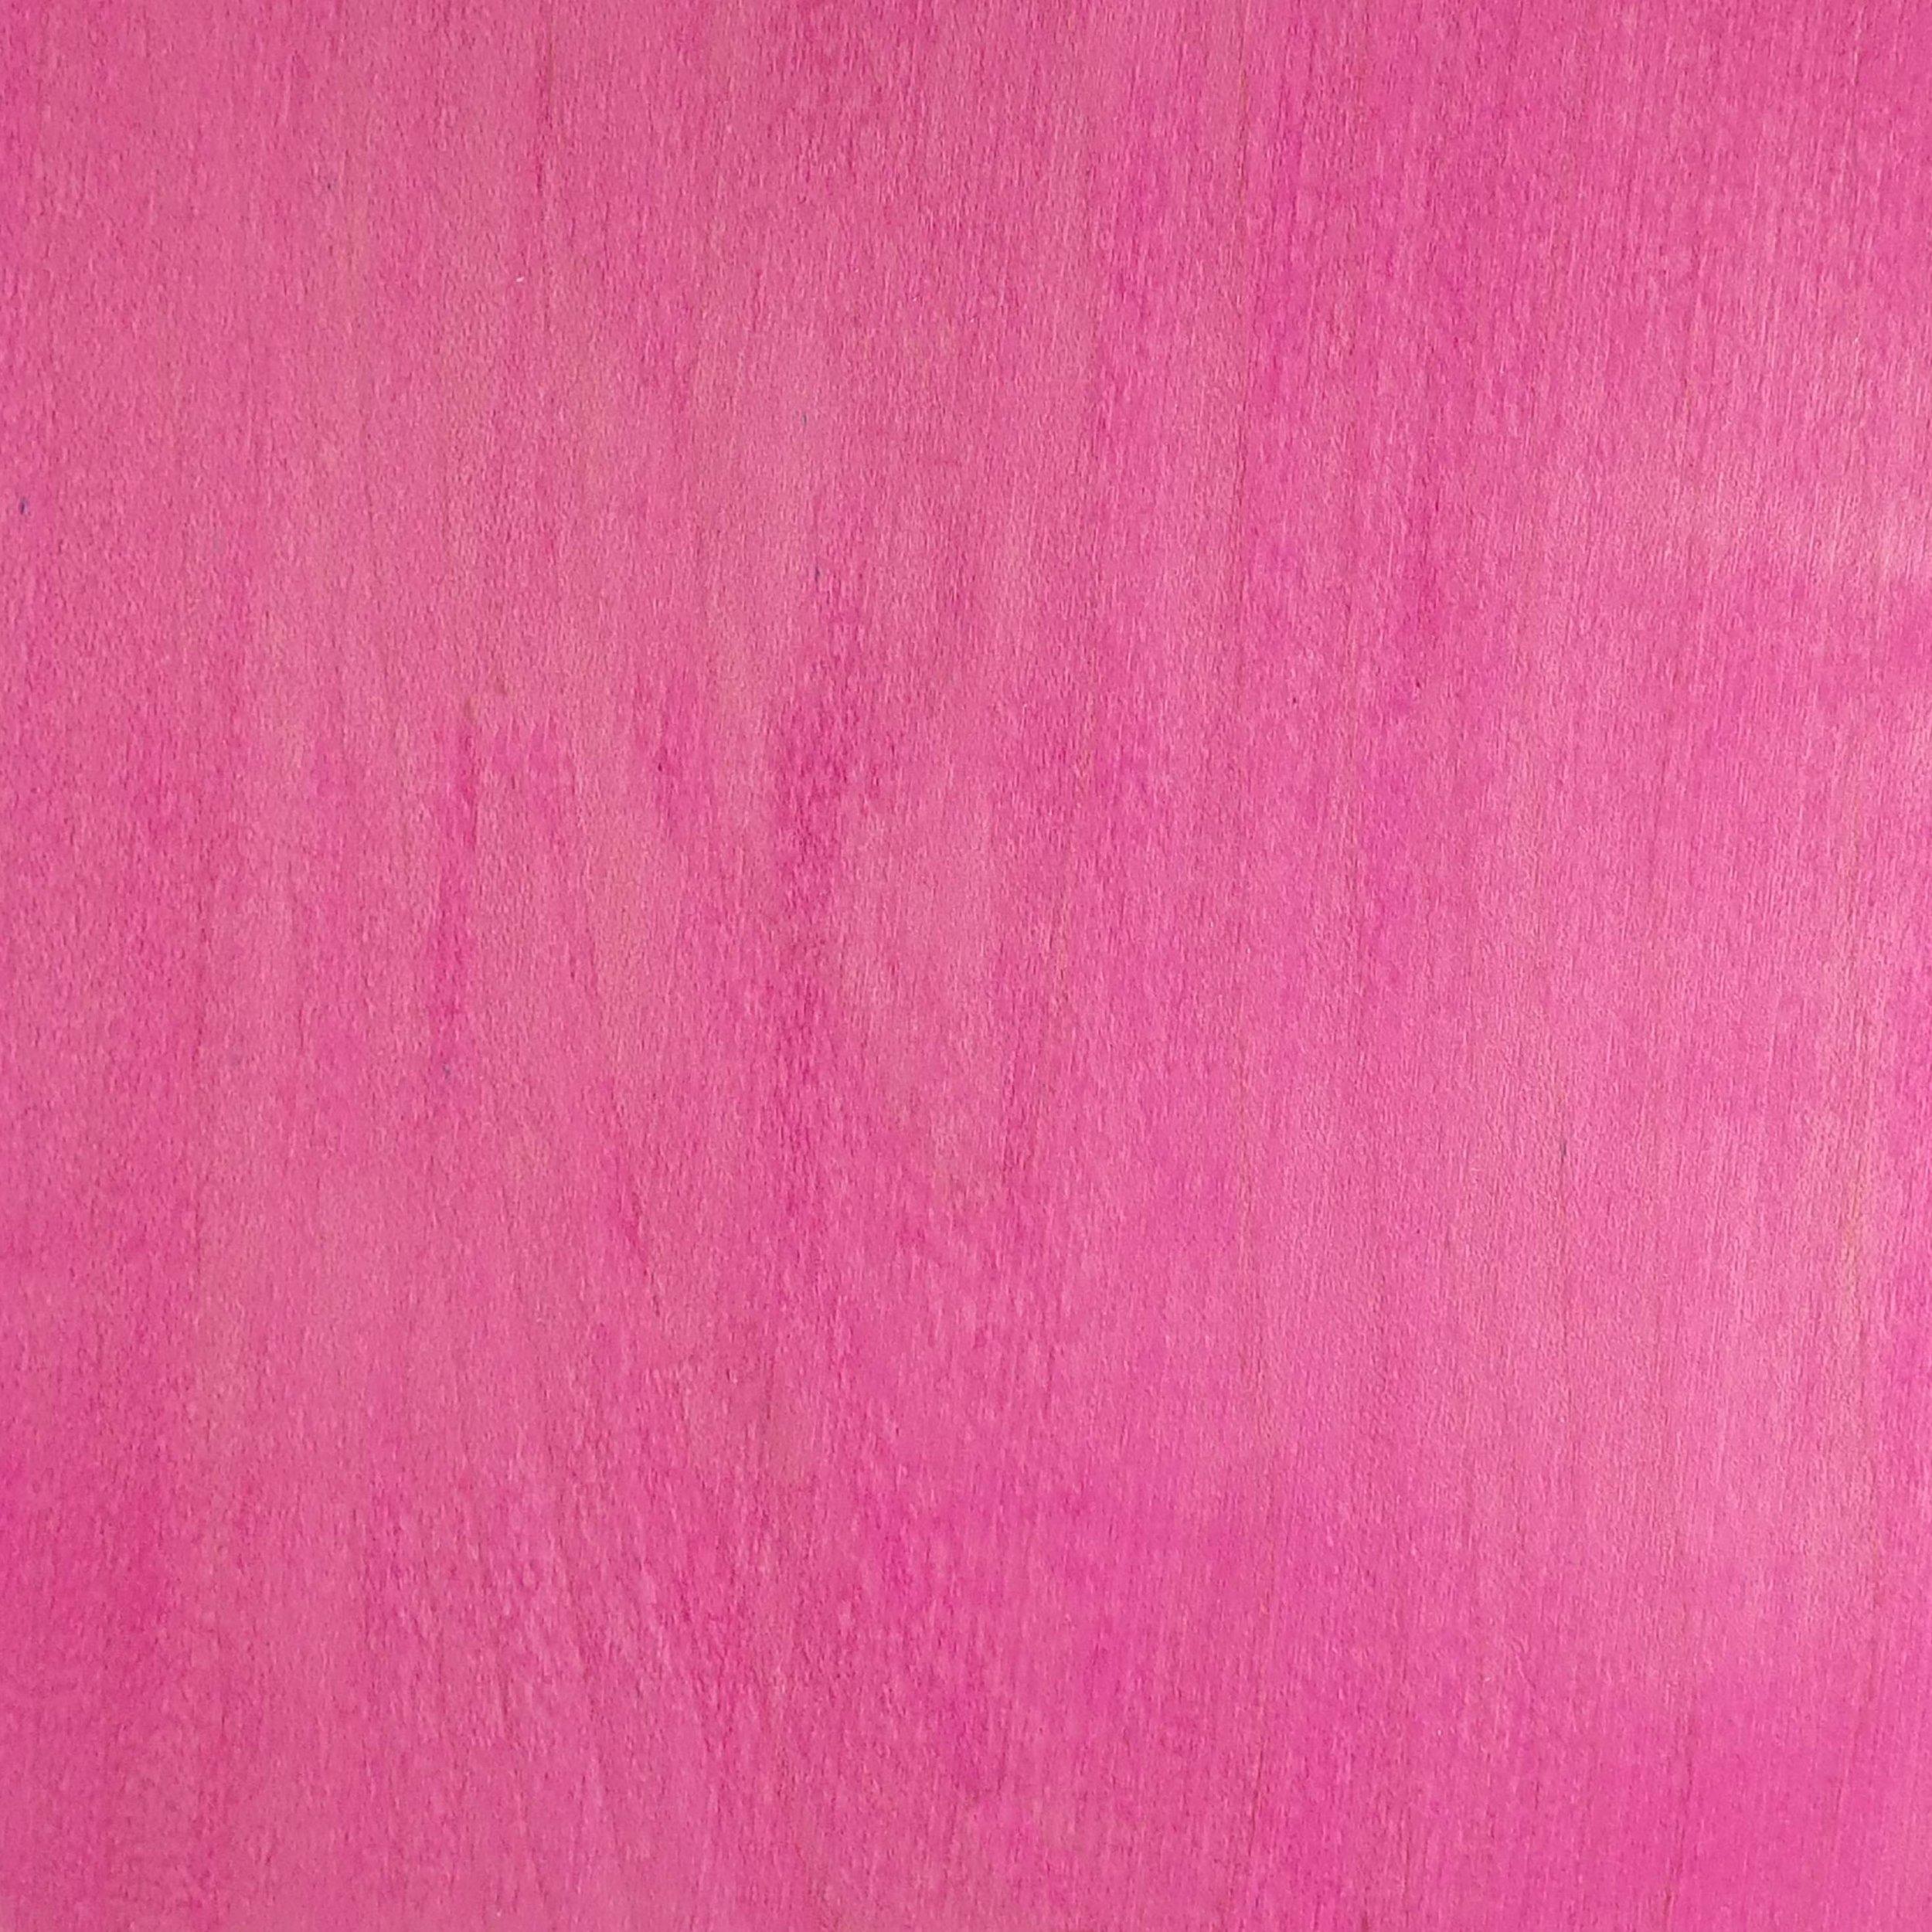 Pink, Bright